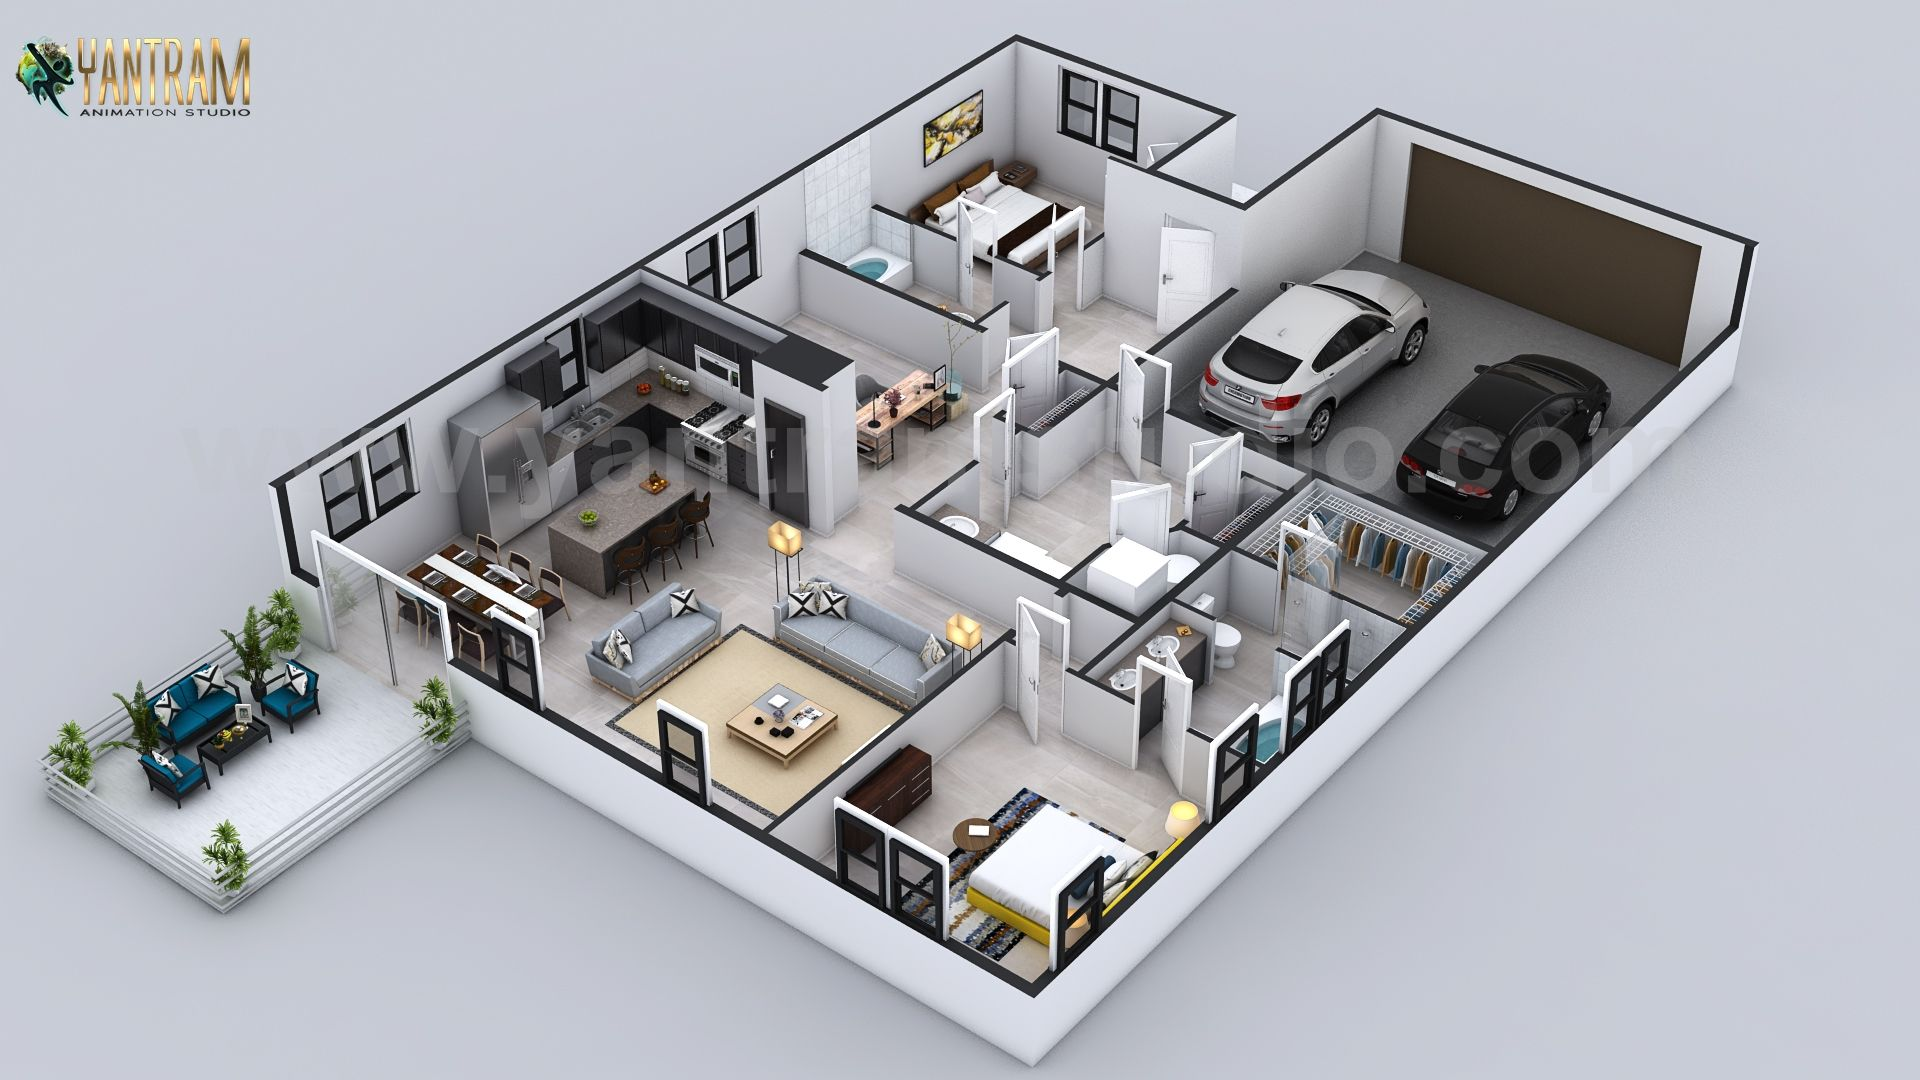 Modern 3d Floorplan Design For Residential House With Garageslot Doha Qatar Floor Plan Design Floor Plans Plan Design